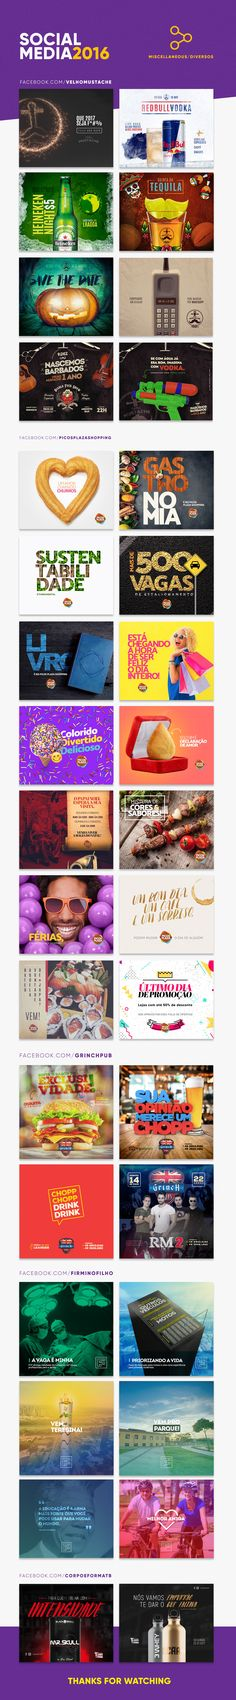 Social Media Posts - 2016 on Behance